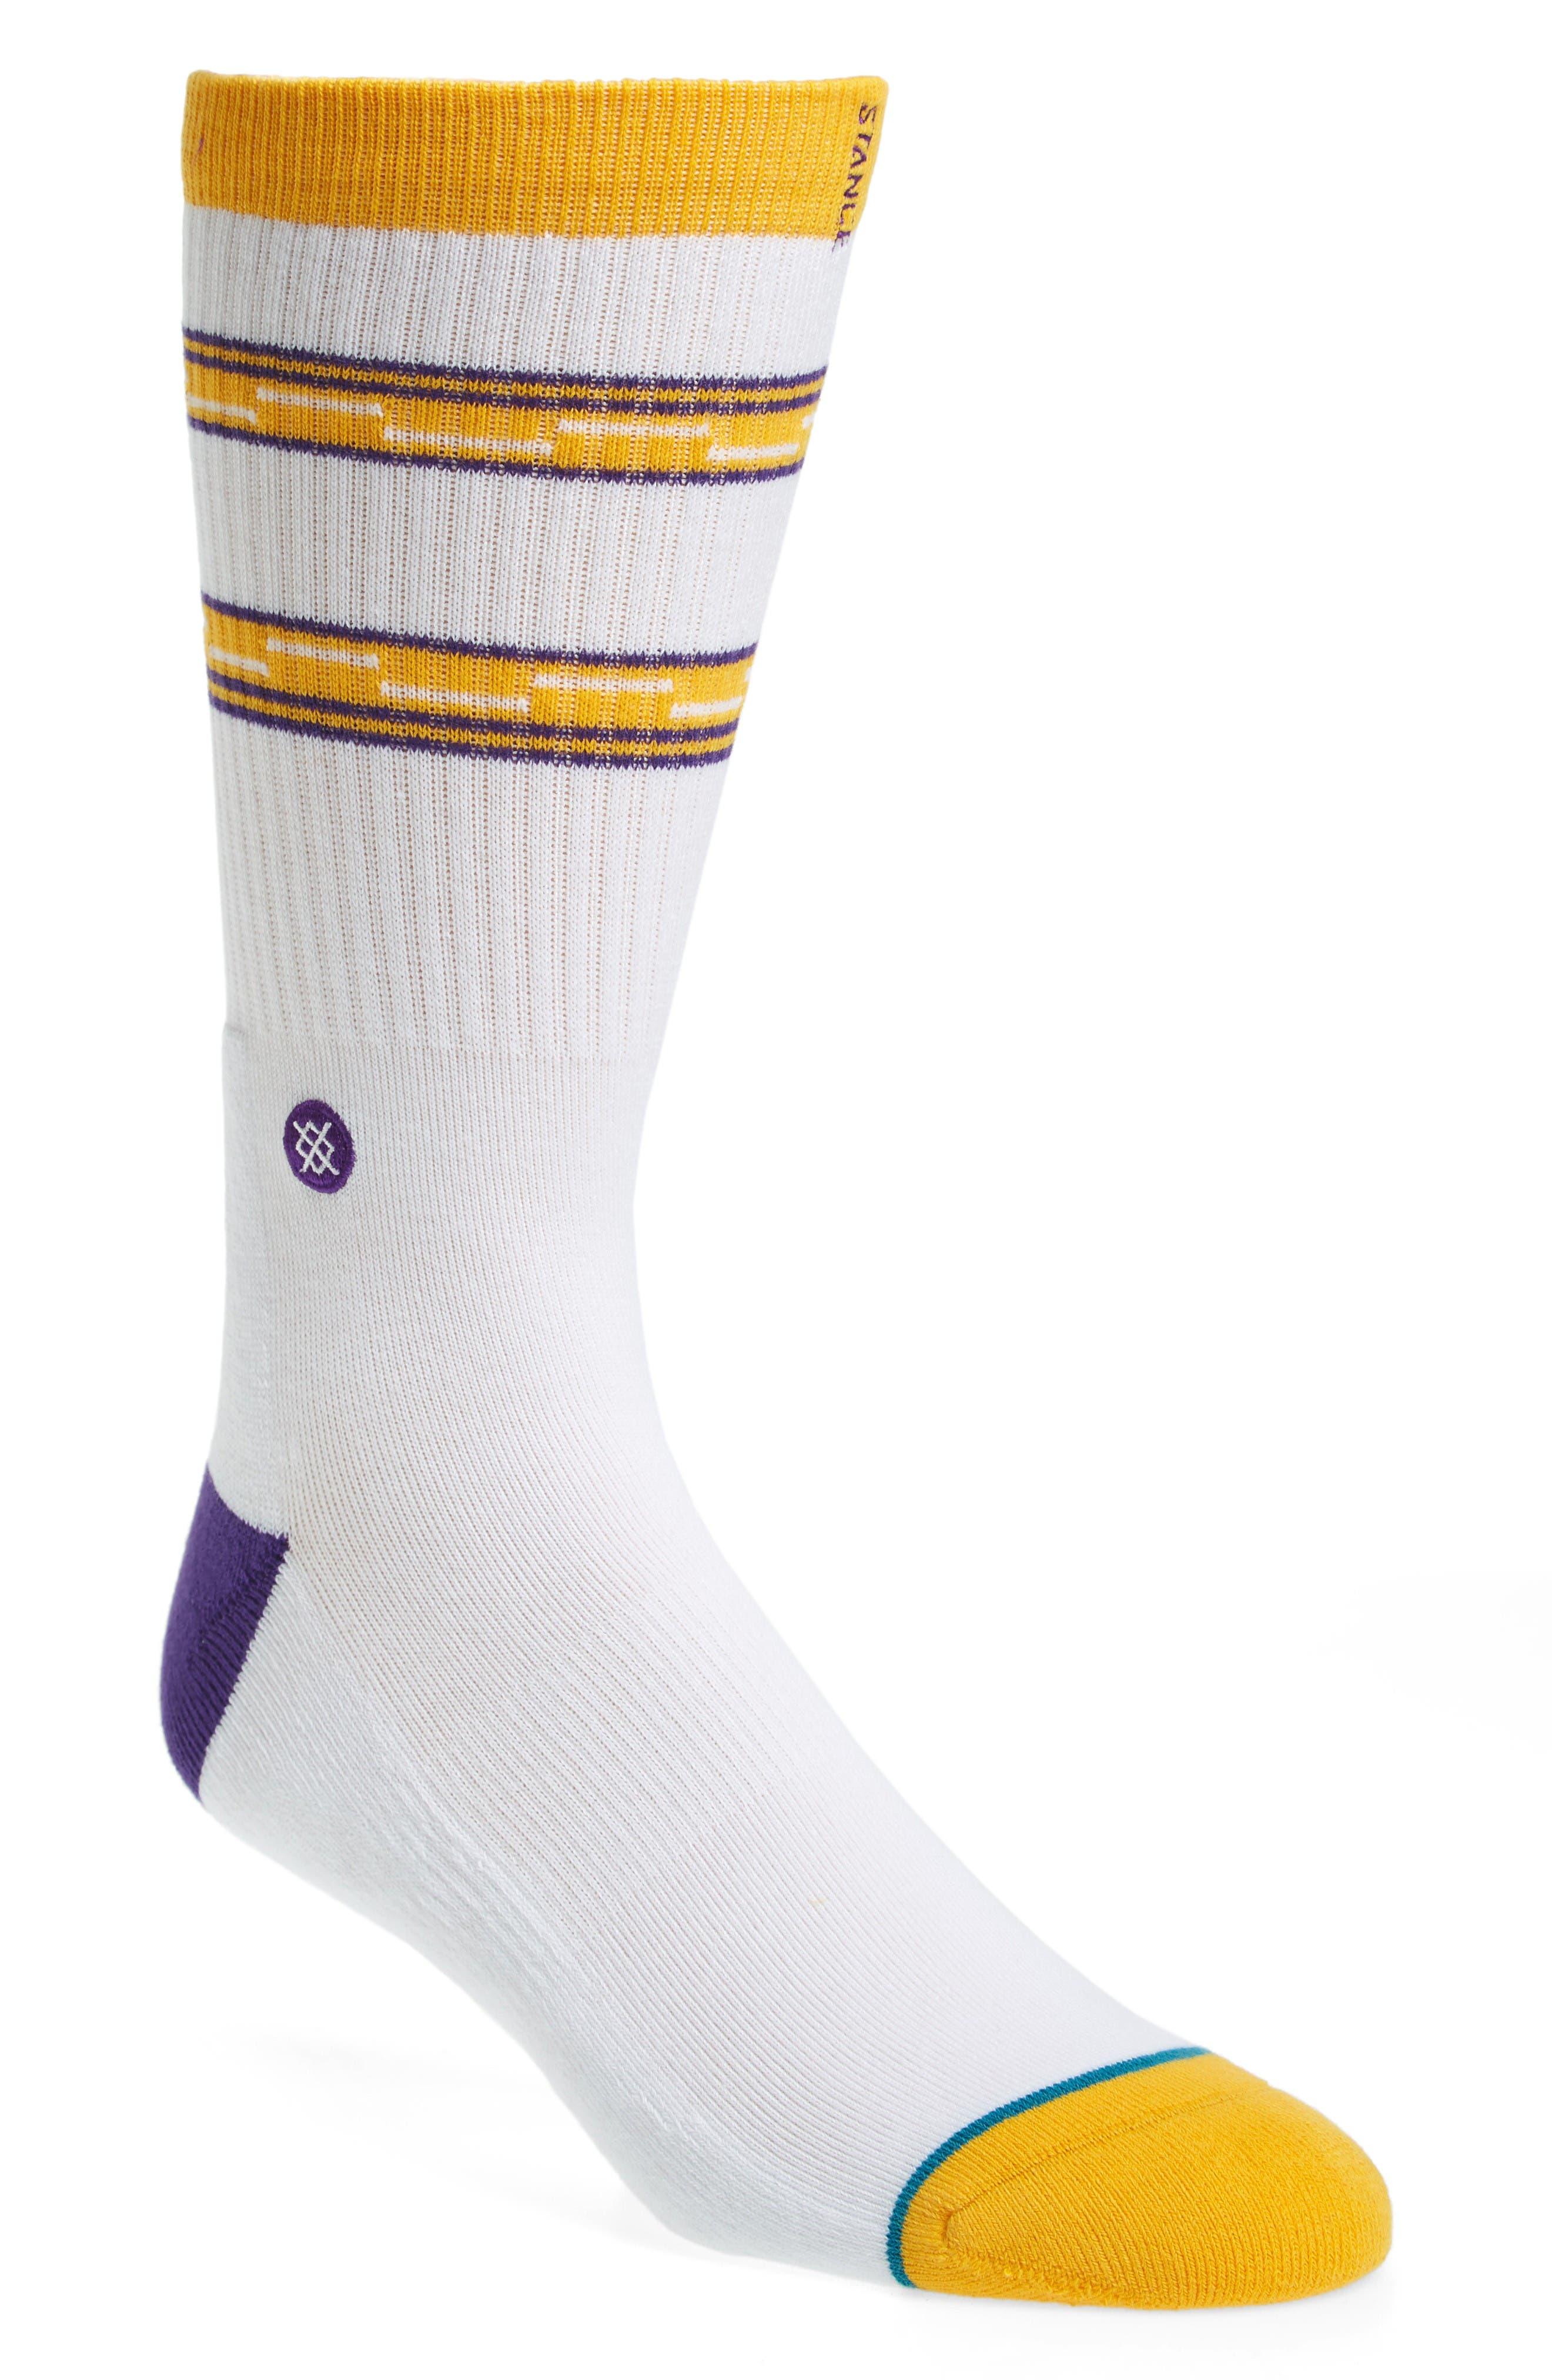 Los Angeles Lakers Arena Core Socks,                             Main thumbnail 1, color,                             White